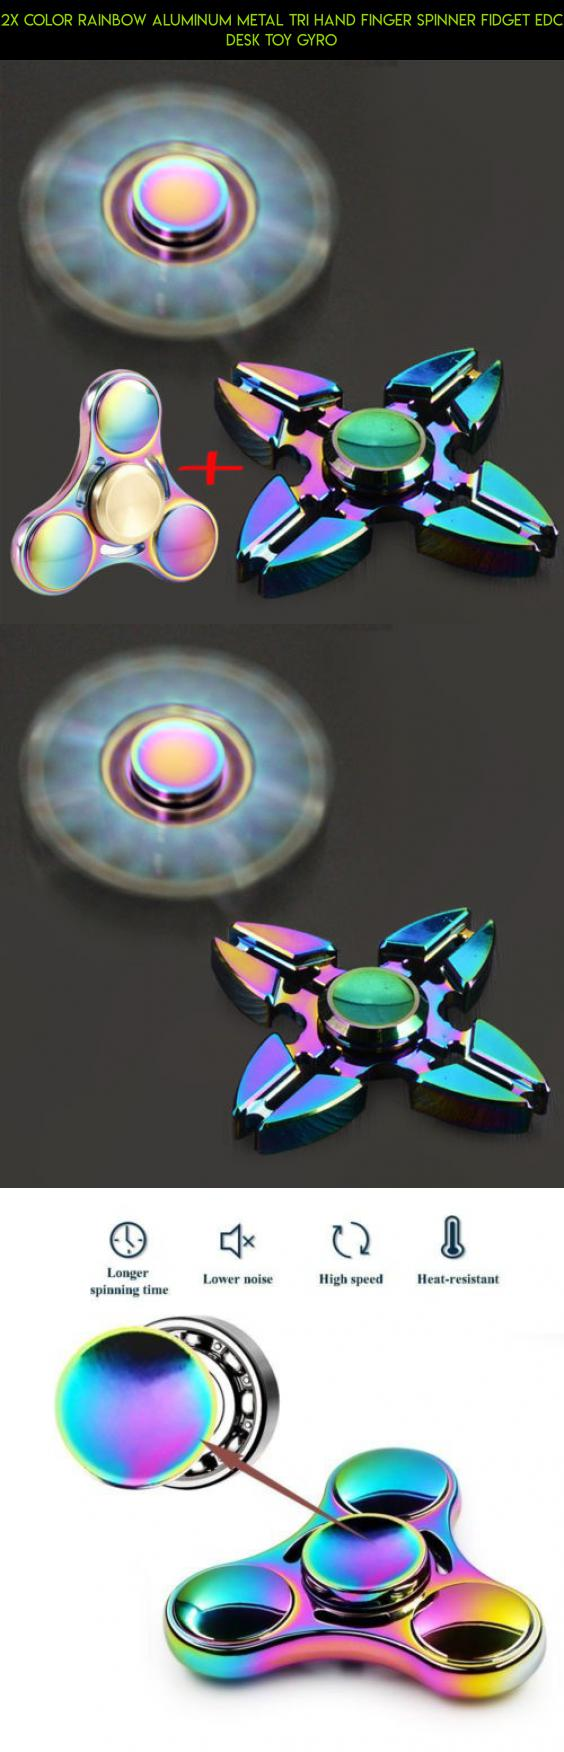 Color Rainbow Aluminum Metal Tri Hand Finger Spinner Fidget EDC Desk Toy Gyro